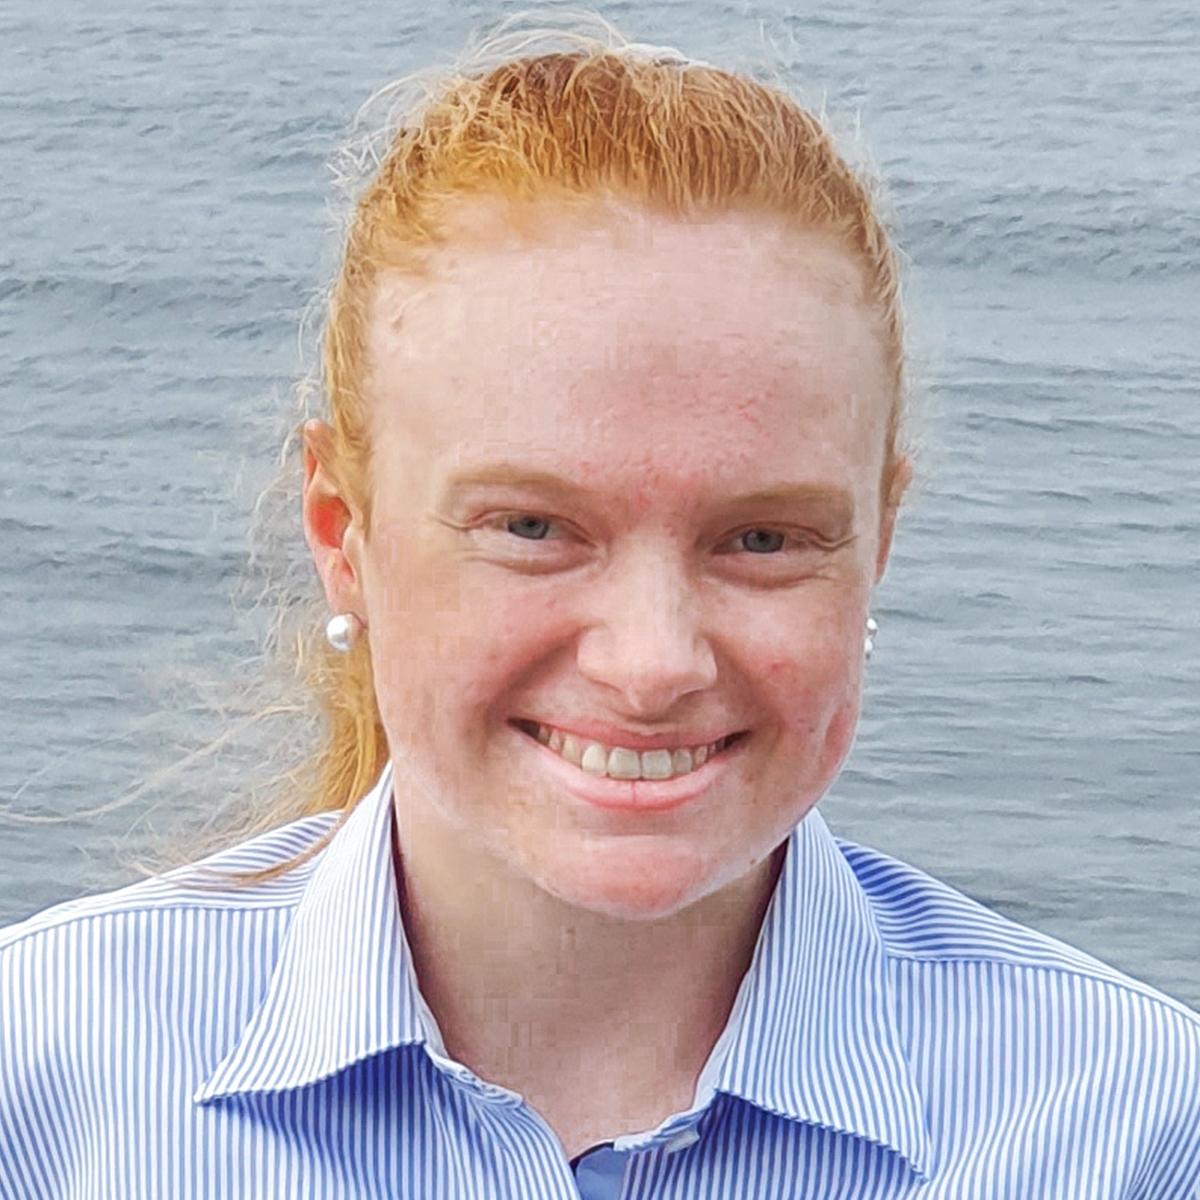 Alva Hansson